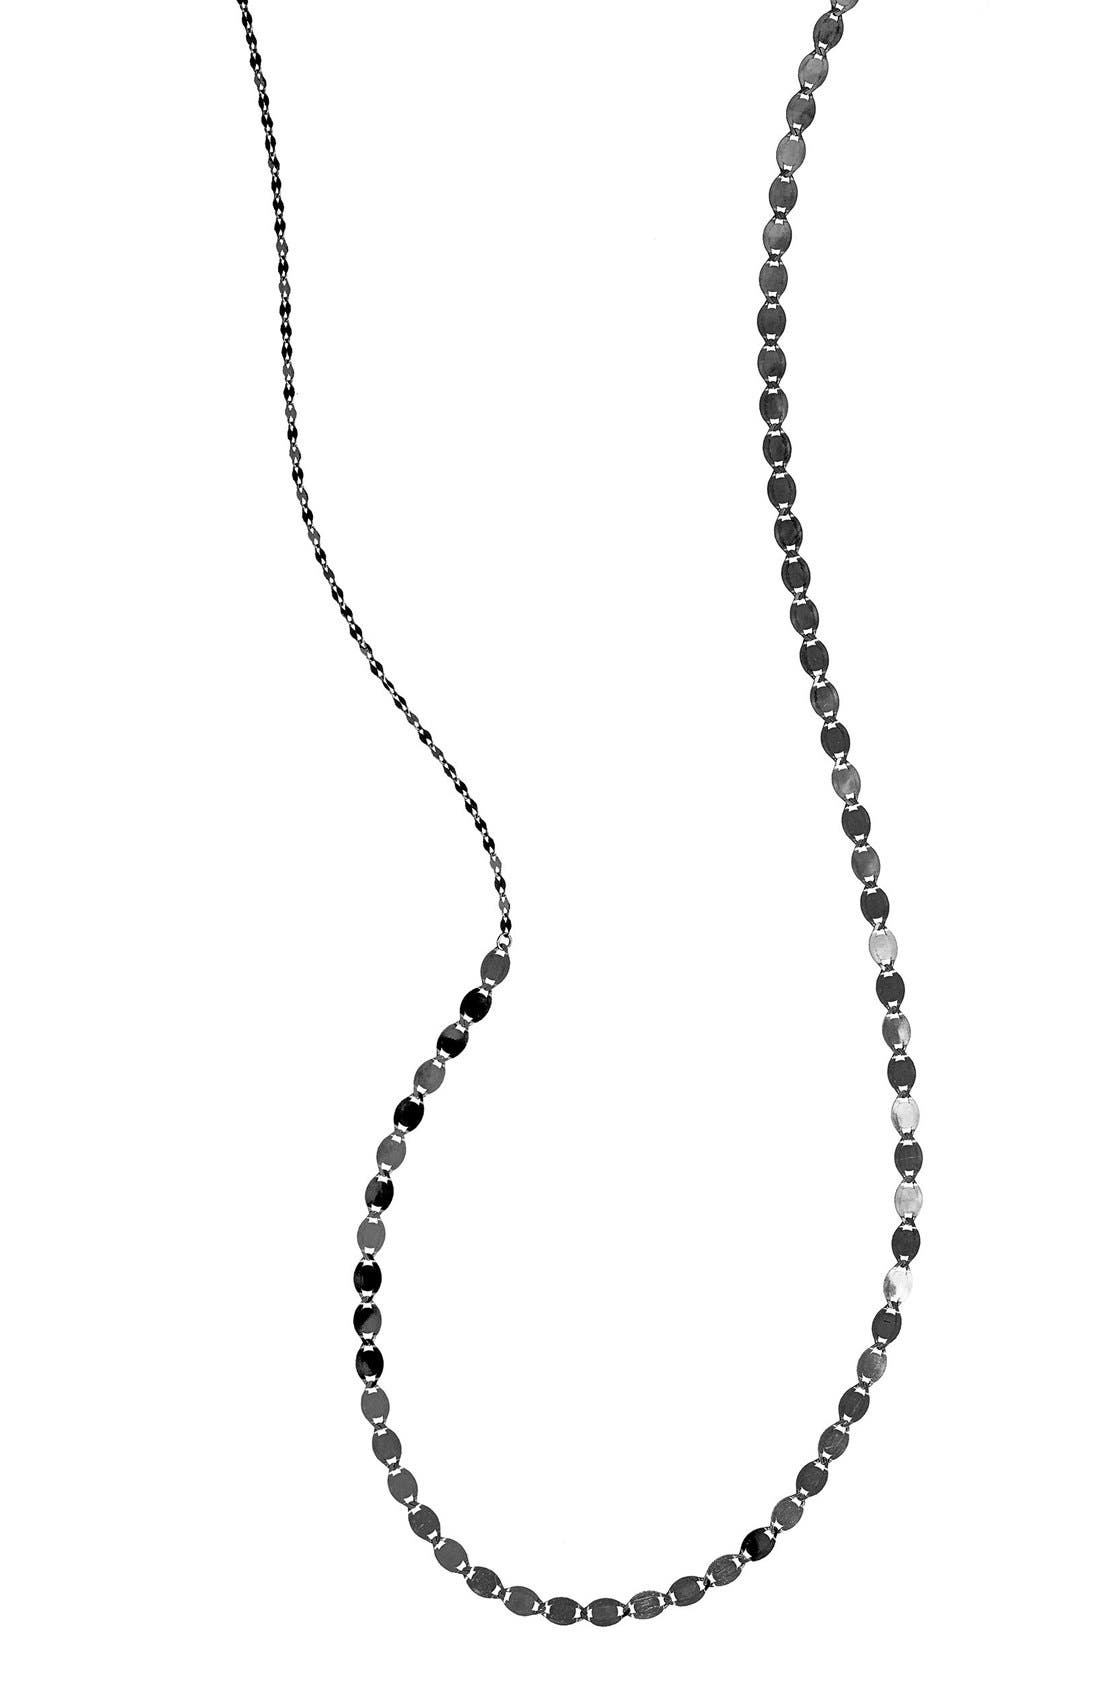 Lana Jewelry Nude Collar Necklace